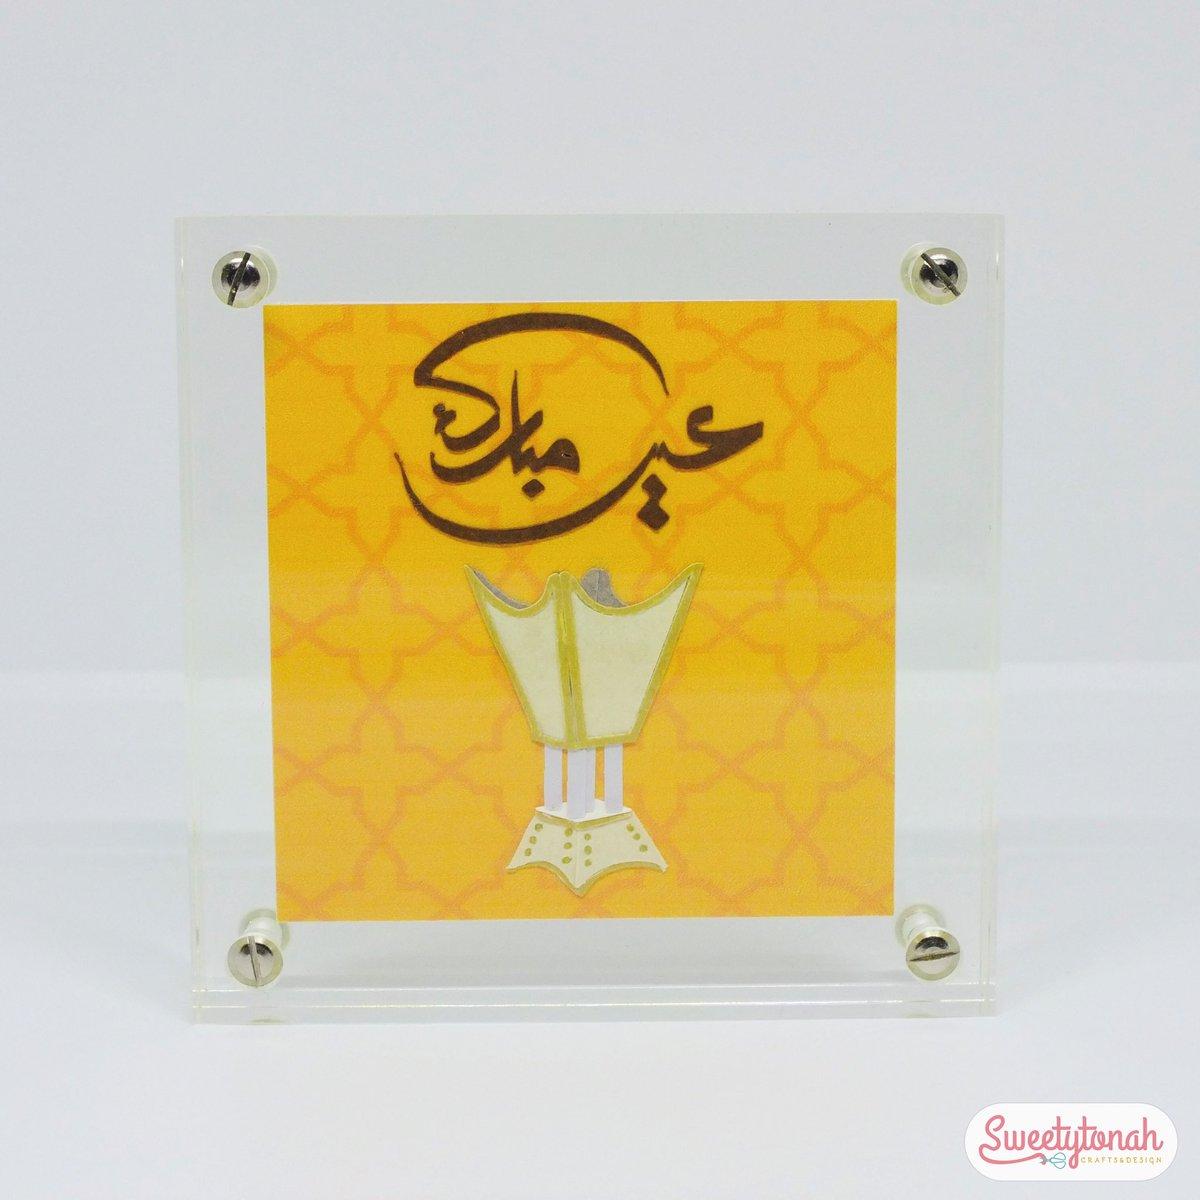 ♡ Happy Eid ♡ #eid #eid_mubarak #illustration  #papercrafting #paperart #paperwork #papercraft #art #artcollective #papercrafting #craftwork #hobby #animefanart #art #artcollective #igdaily #picoftheday #sweety_paperart   #اعمال_يدوية #اعمال_فنية #عيدالفطزpic.twitter.com/TRXXU1oPAt